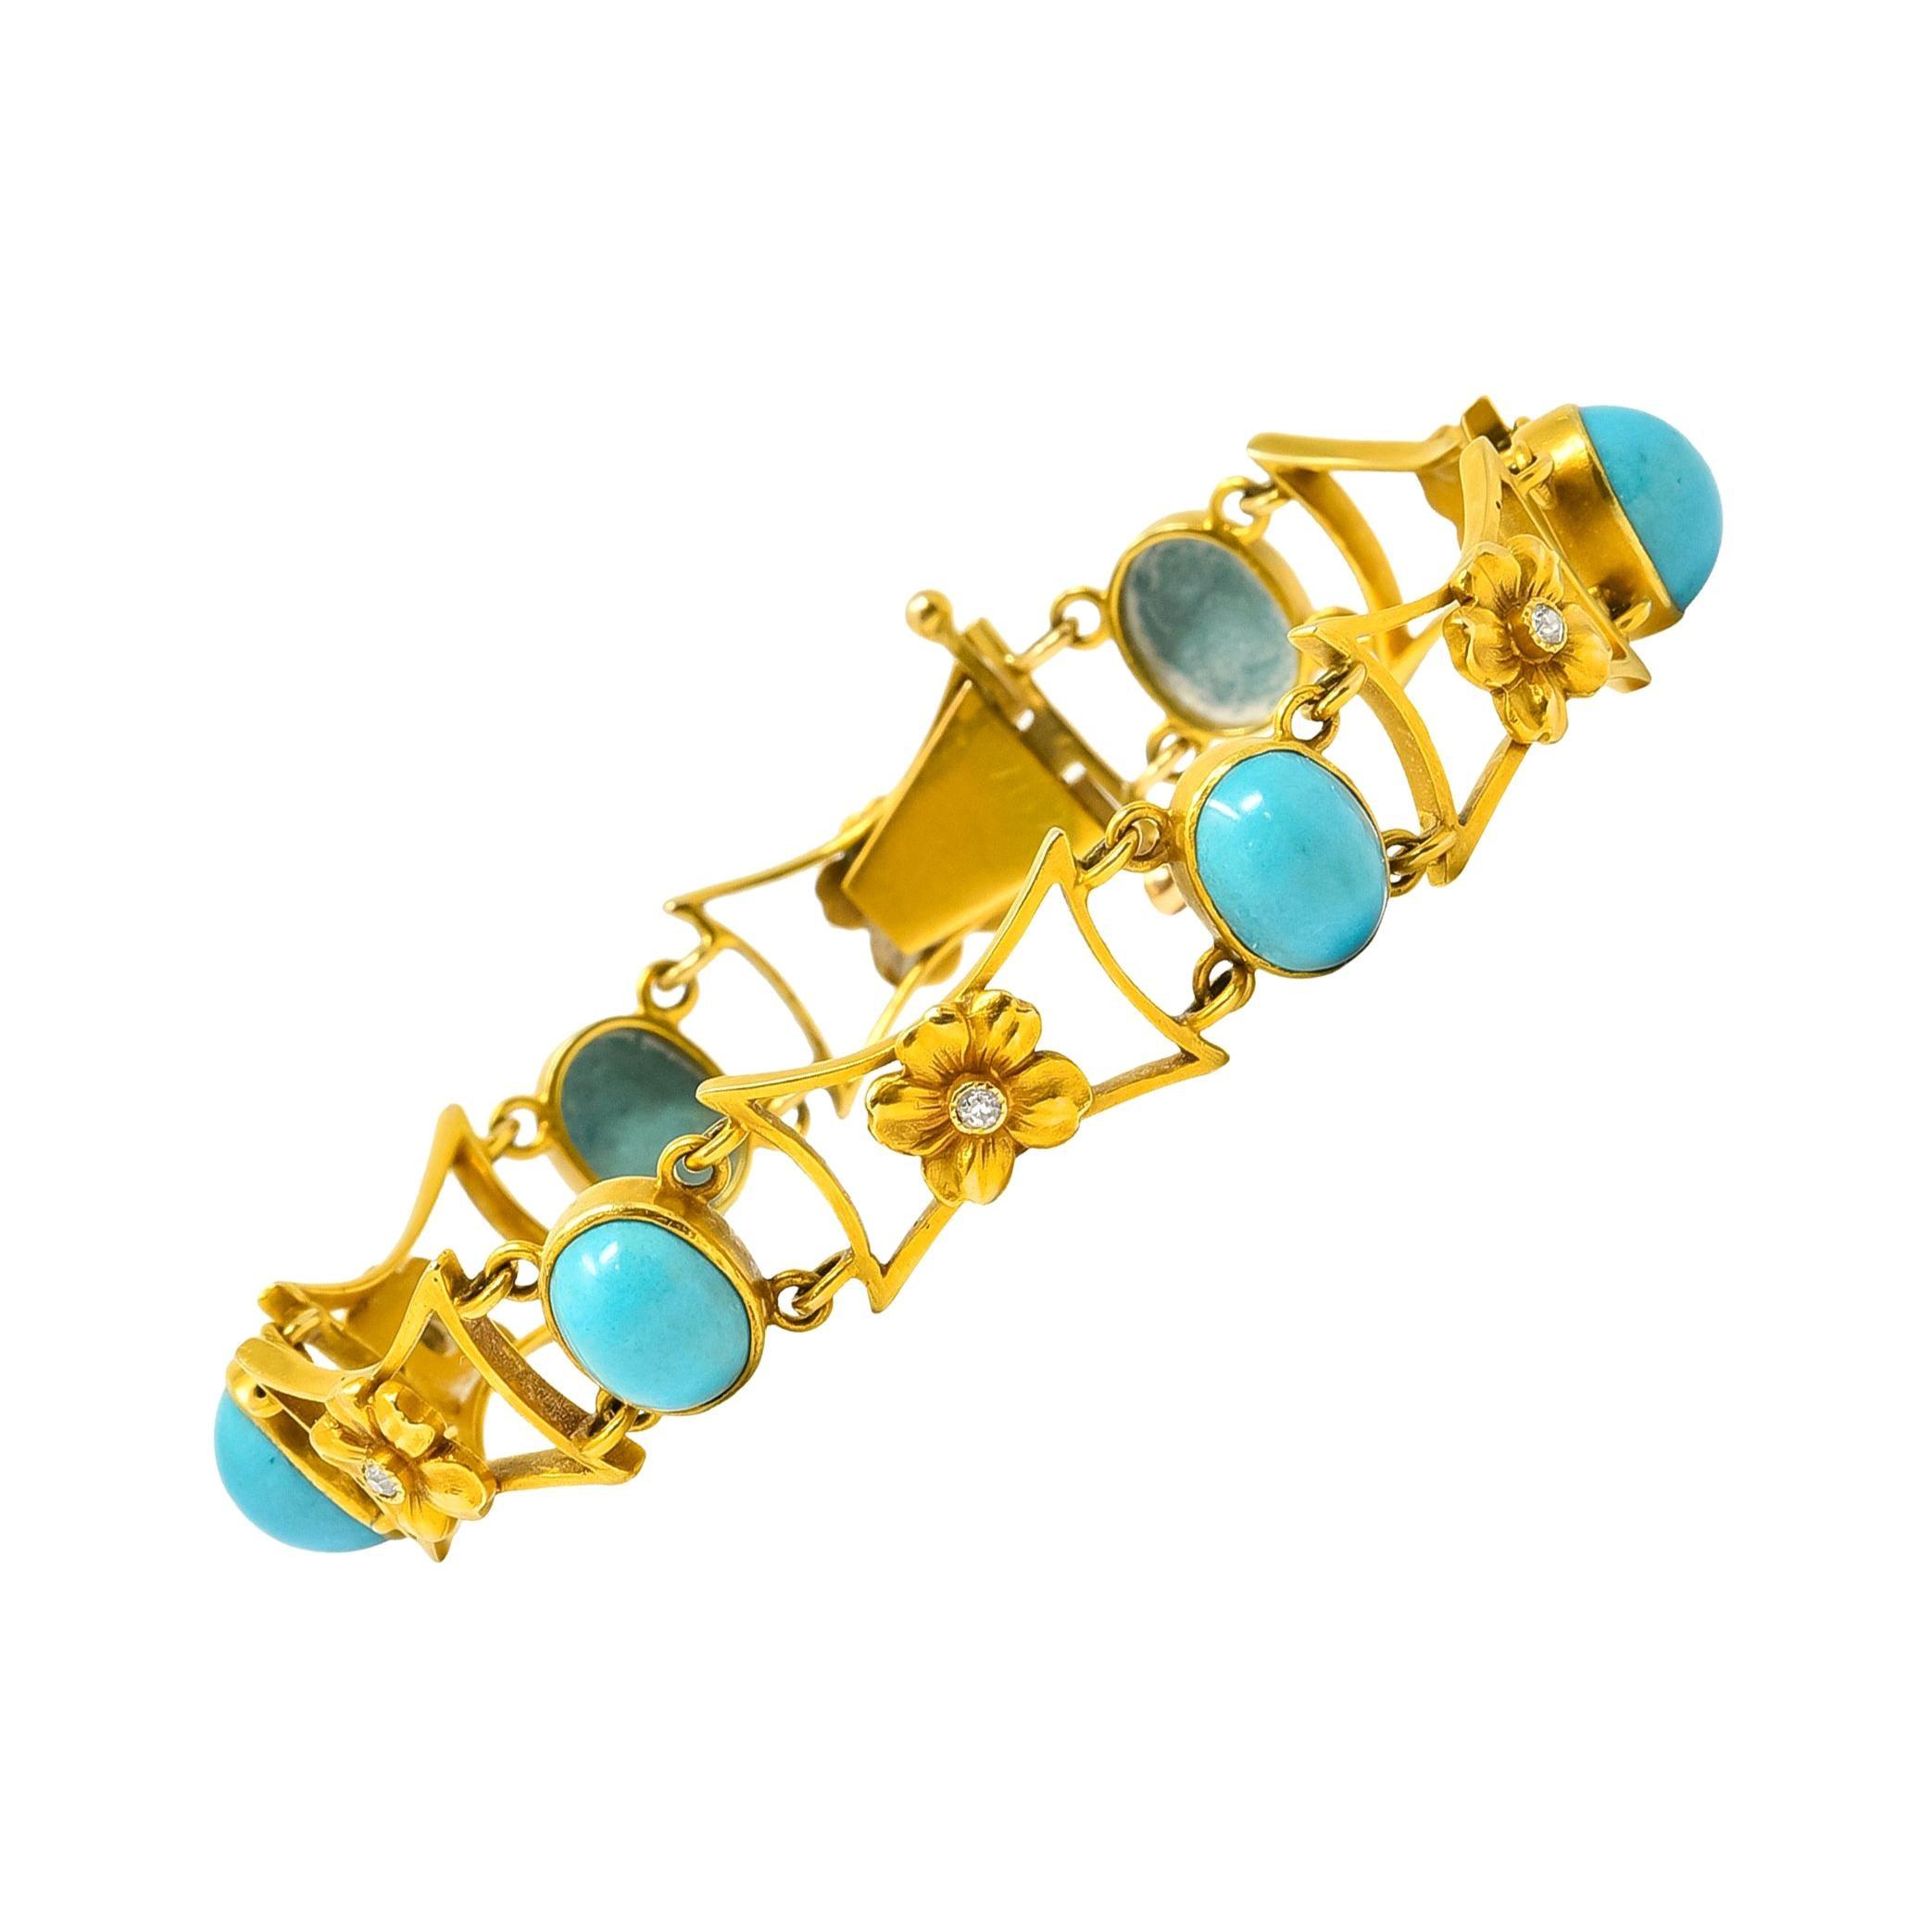 1905 Victorian Turquoise Diamond 14 Karat Gold Floral Link Bracelet